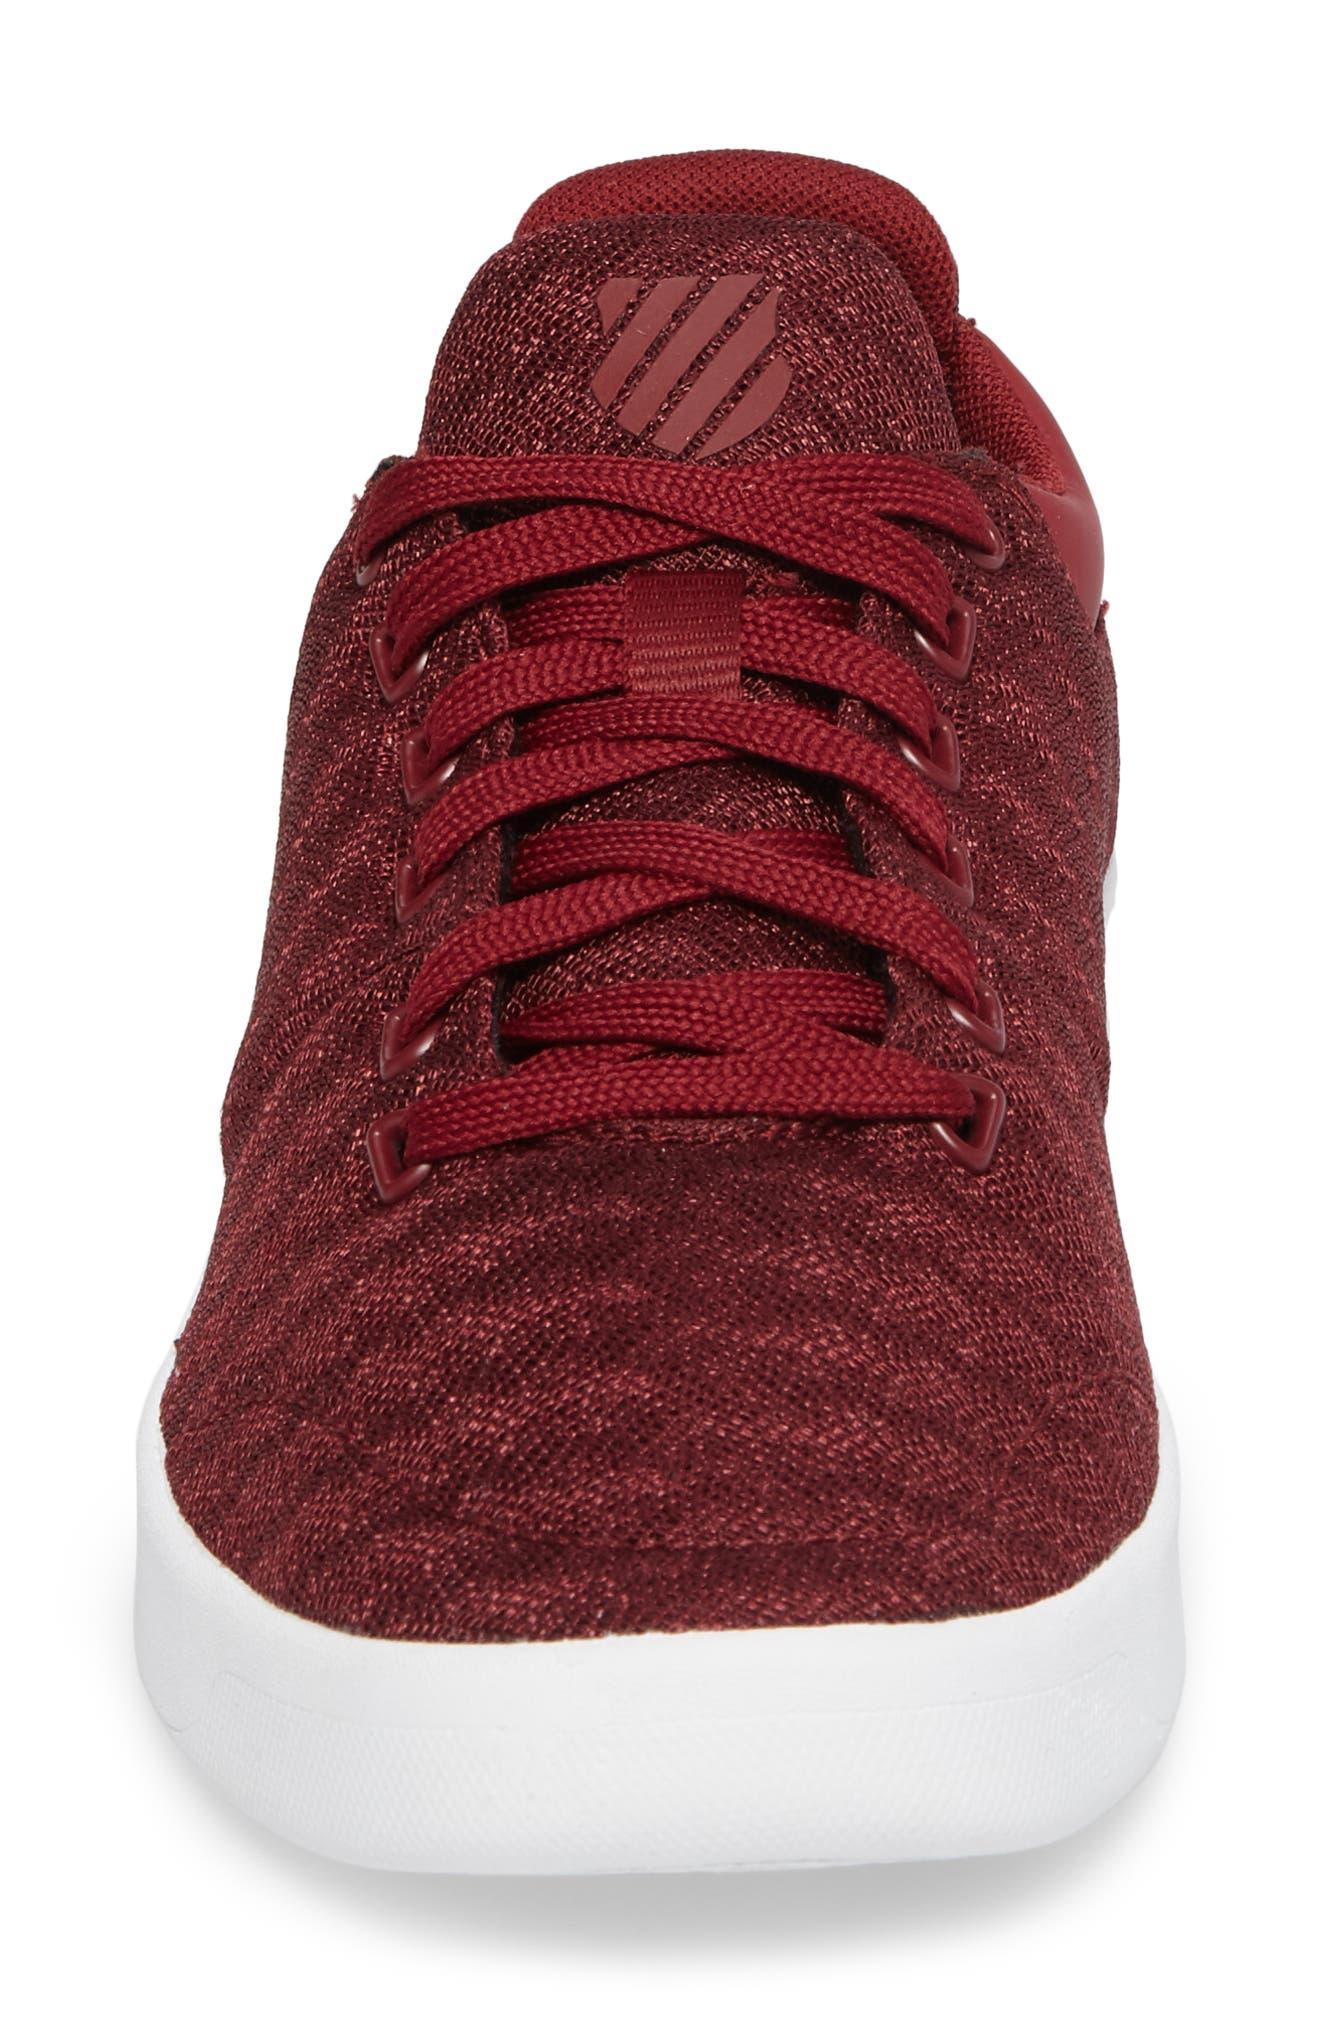 Aero Trainer T Sneaker,                             Alternate thumbnail 4, color,                             Tibetan Red/ White